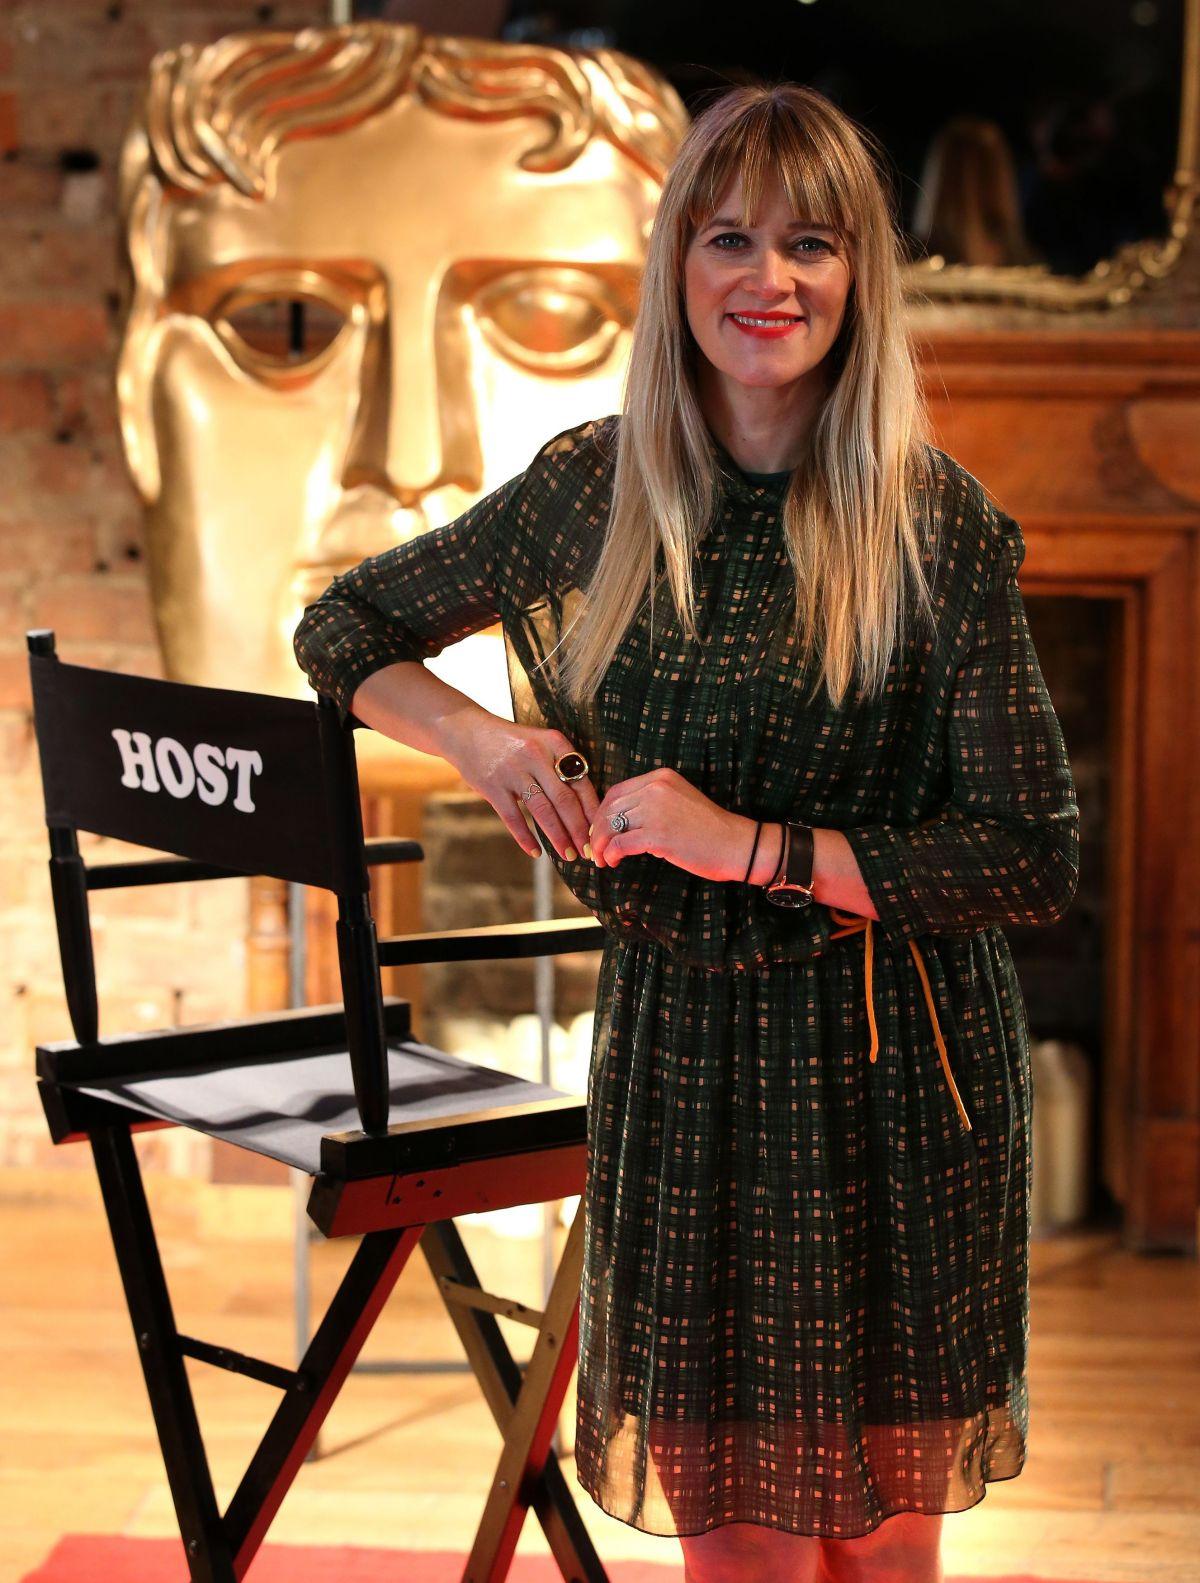 EDITH BOWMAN at British Academy Scotland Awards Host Photoshoot in Glasgow 10/13/2015